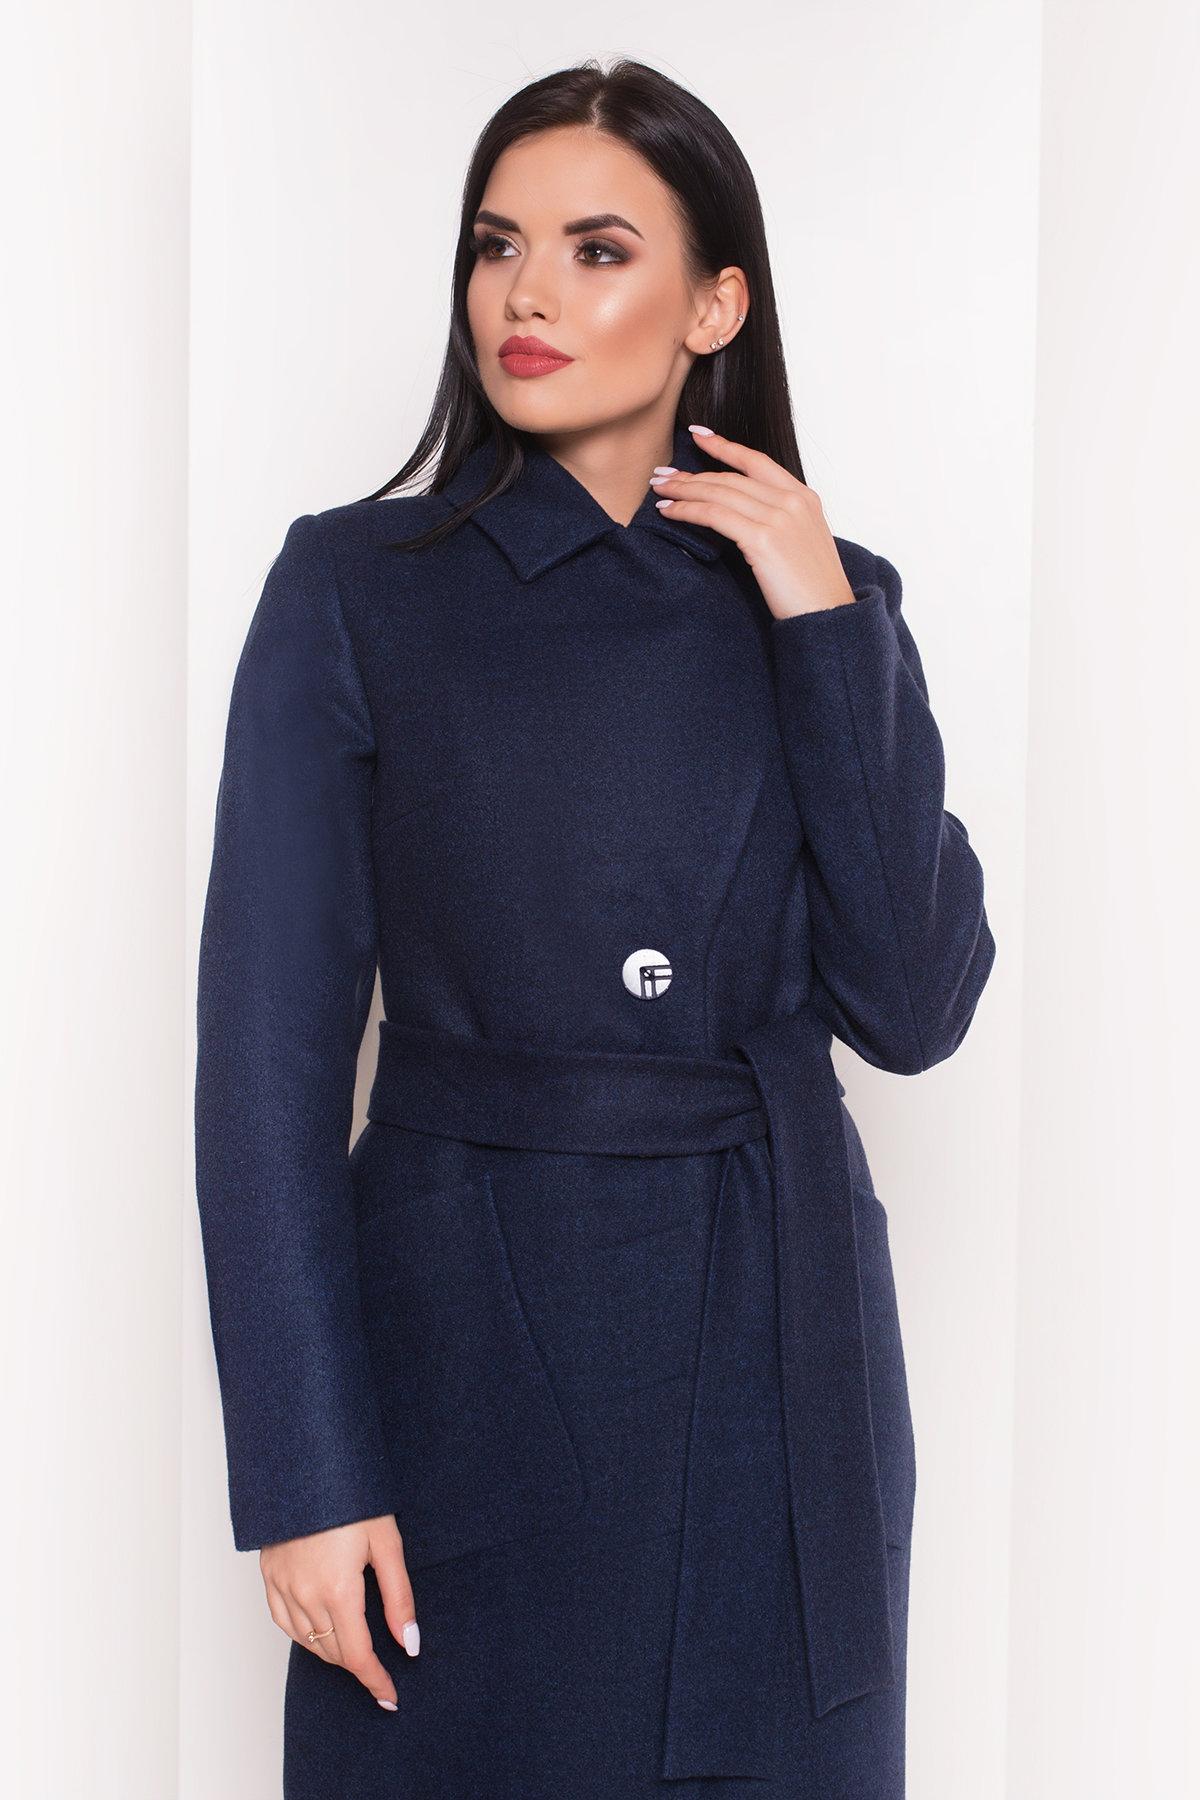 Пальто на весну-осень Габриэлла 4459 АРТ. 36662 Цвет: Темно-синий 17 - фото 5, интернет магазин tm-modus.ru